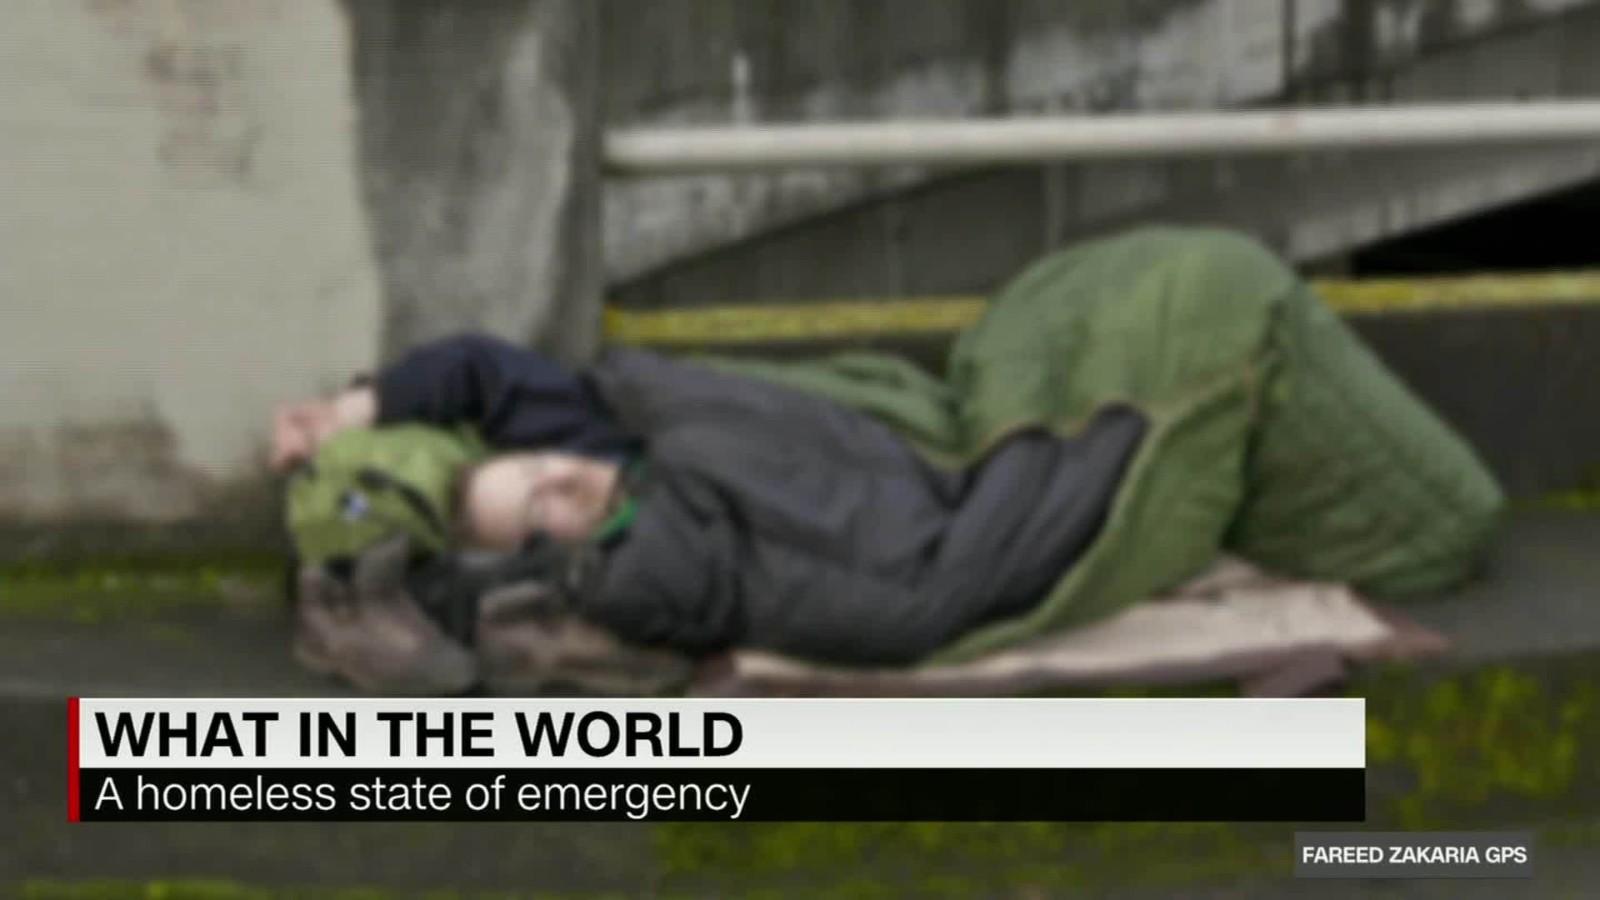 Homelessness Solutions - Magazine cover